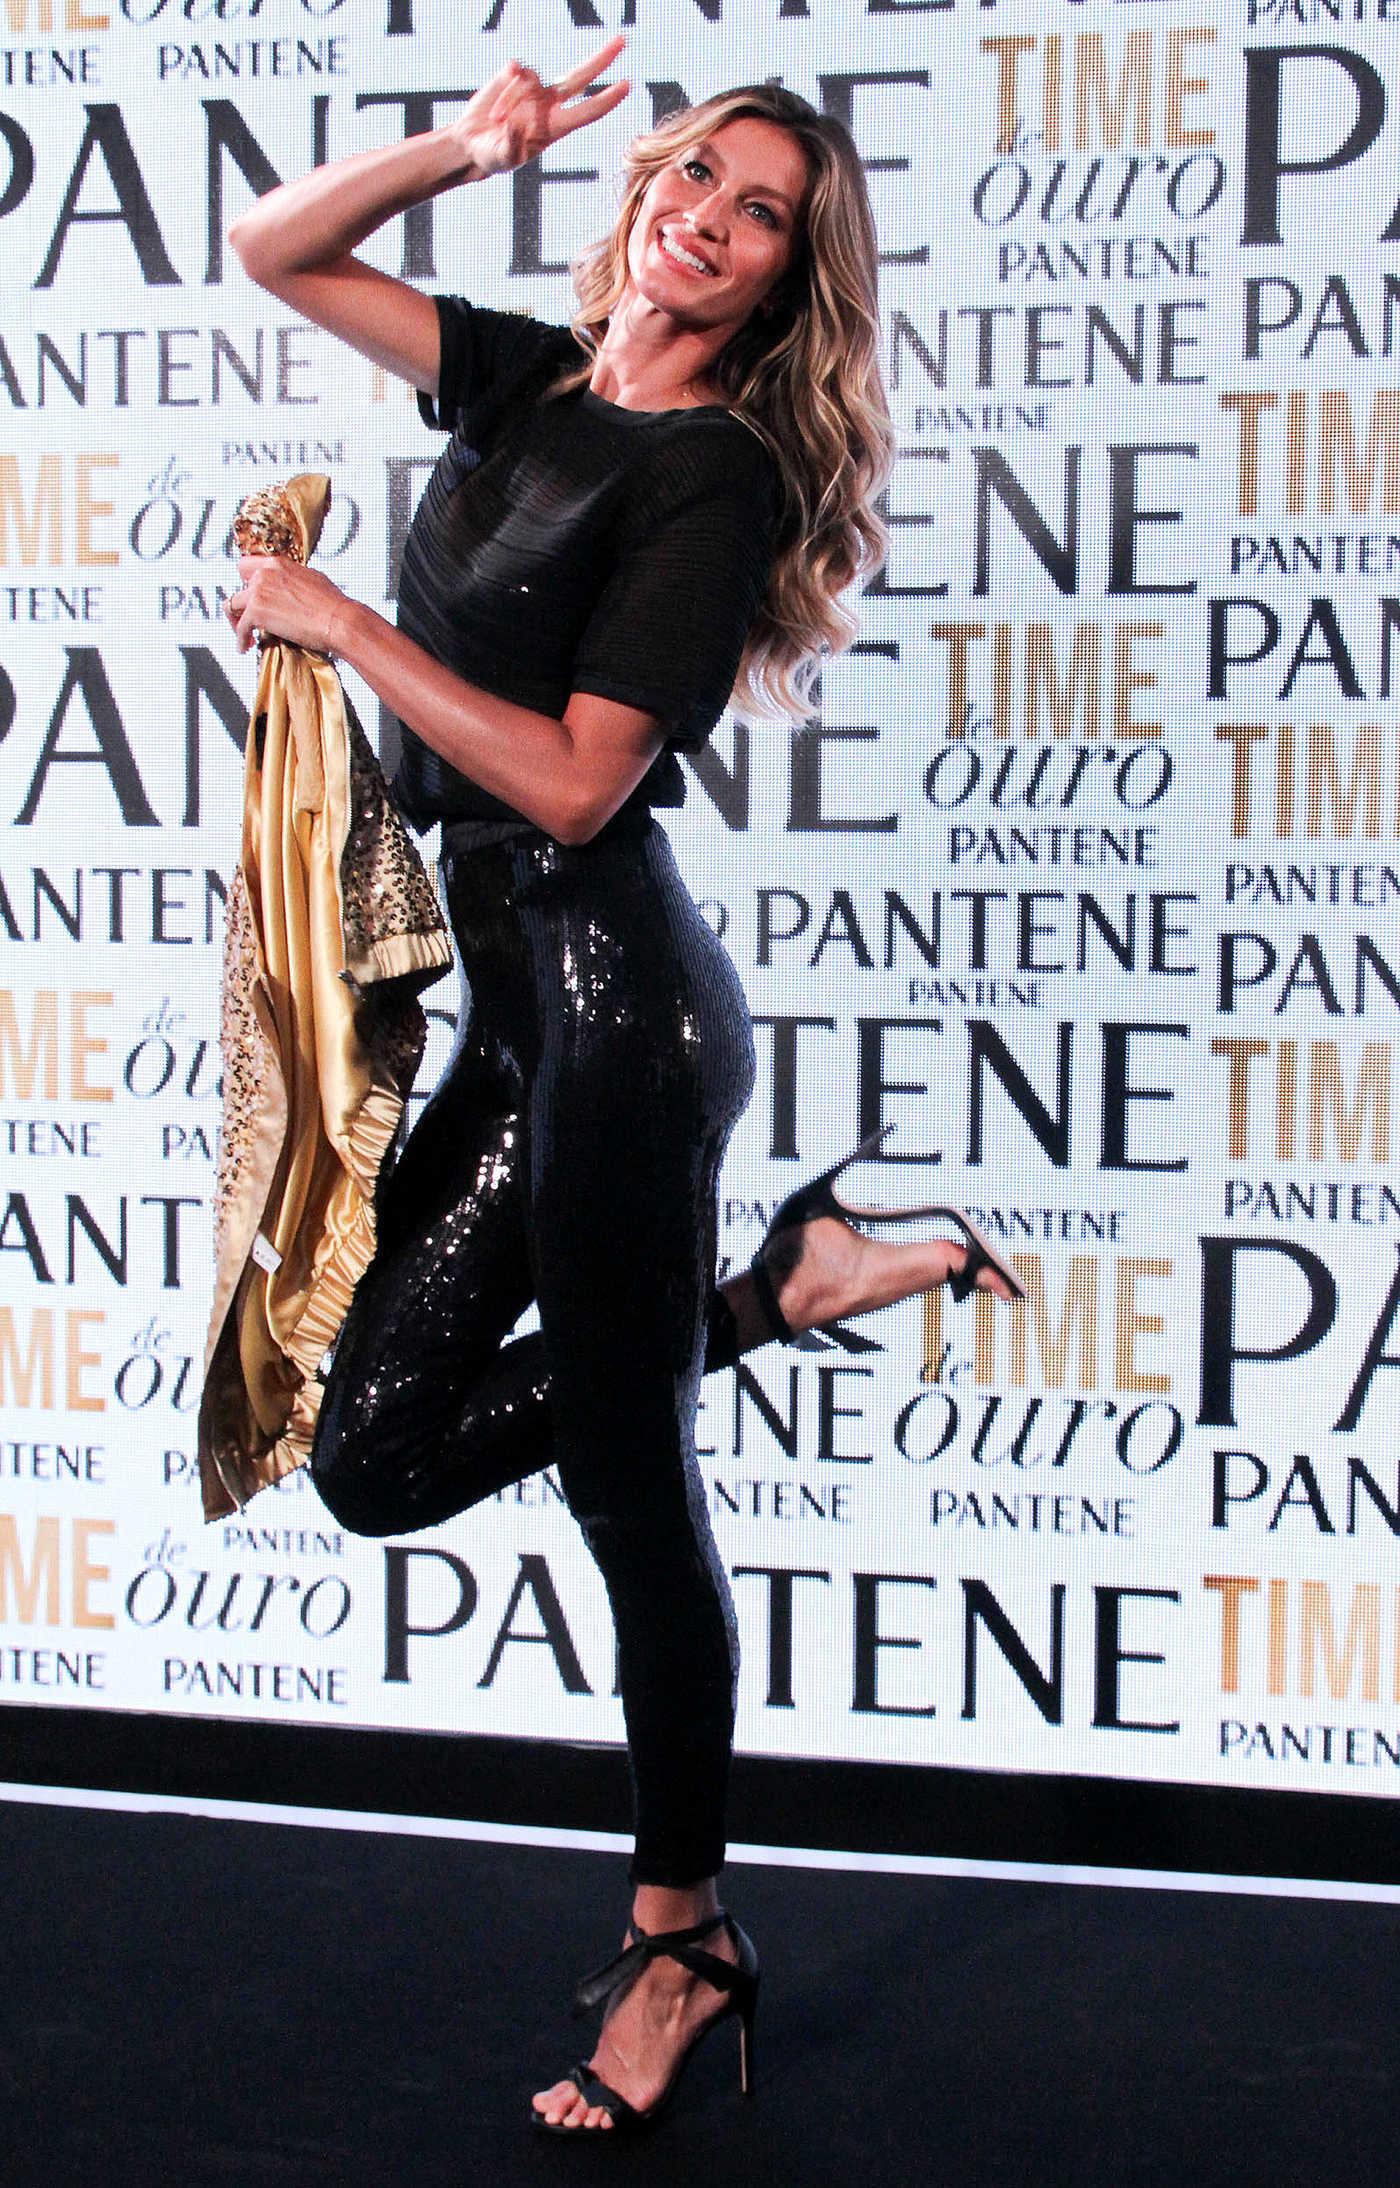 Gisele Bundchen Attends Pantene Campaign in Rio de Janeiro 08/06/2016